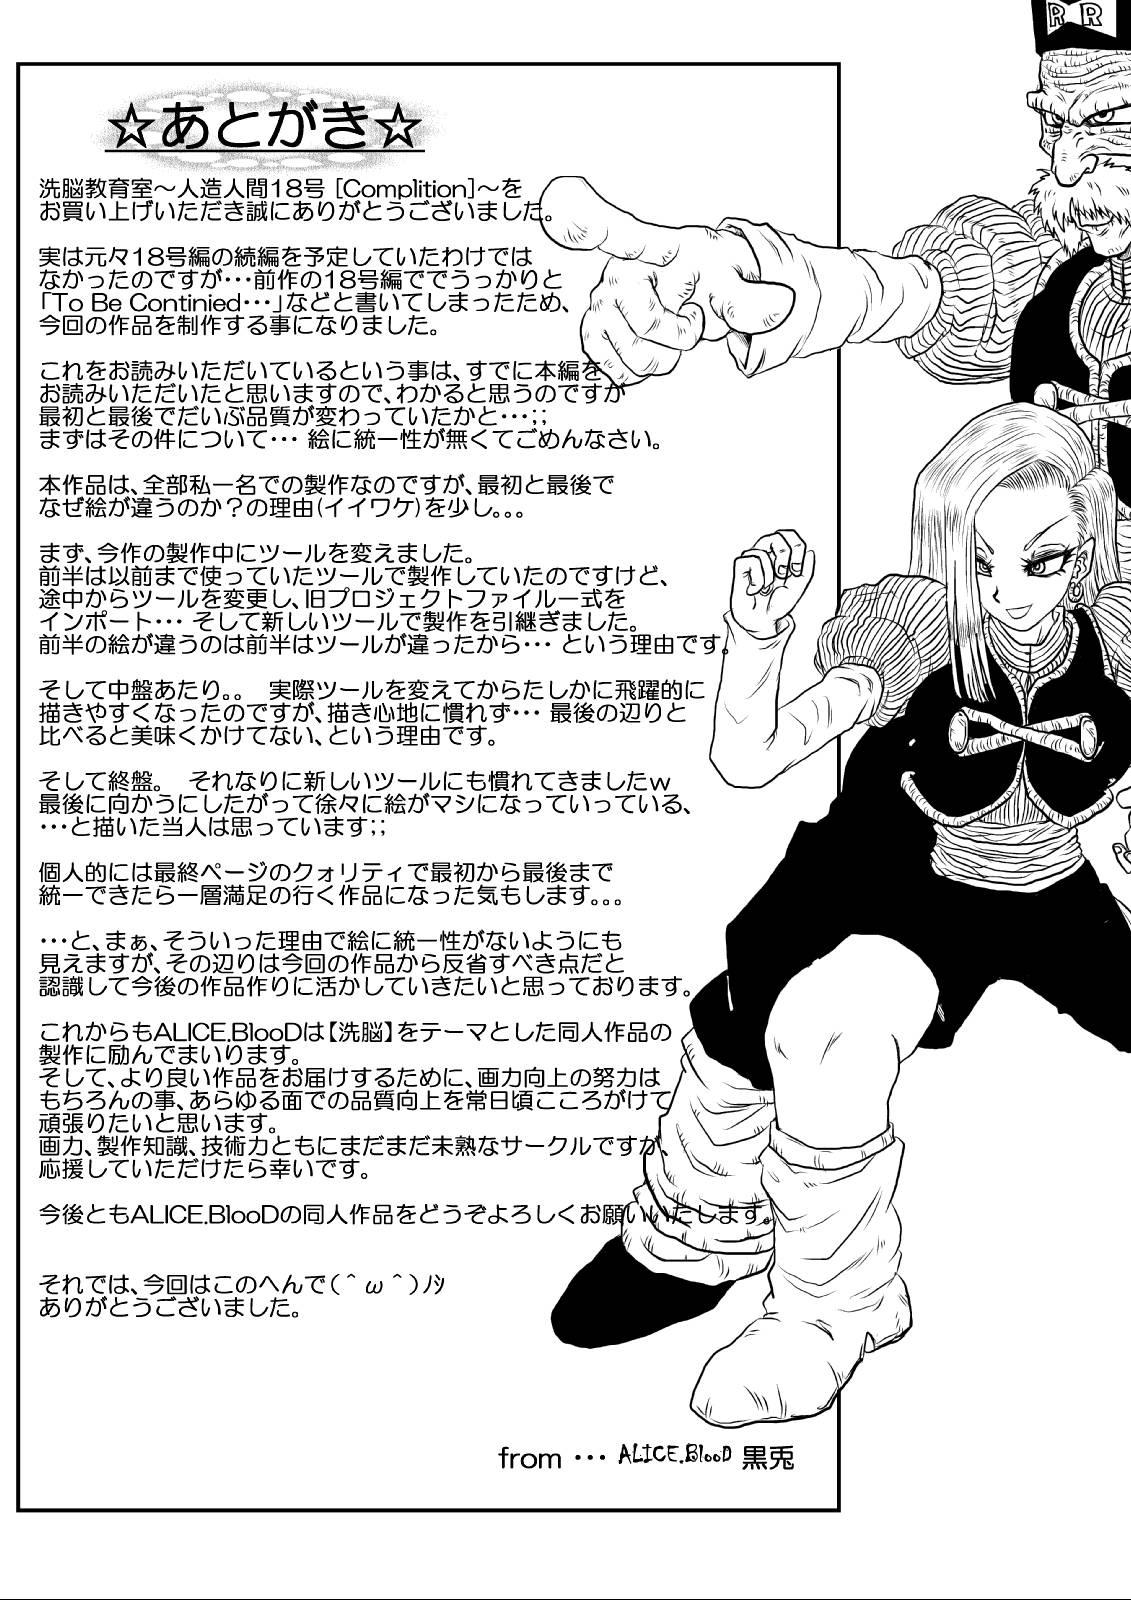 [Alice.Blood] Sennou Kyouiku-shitsu~ Jinzou ☆-kan 18-gou-hen (Dragon Ball Z) 41